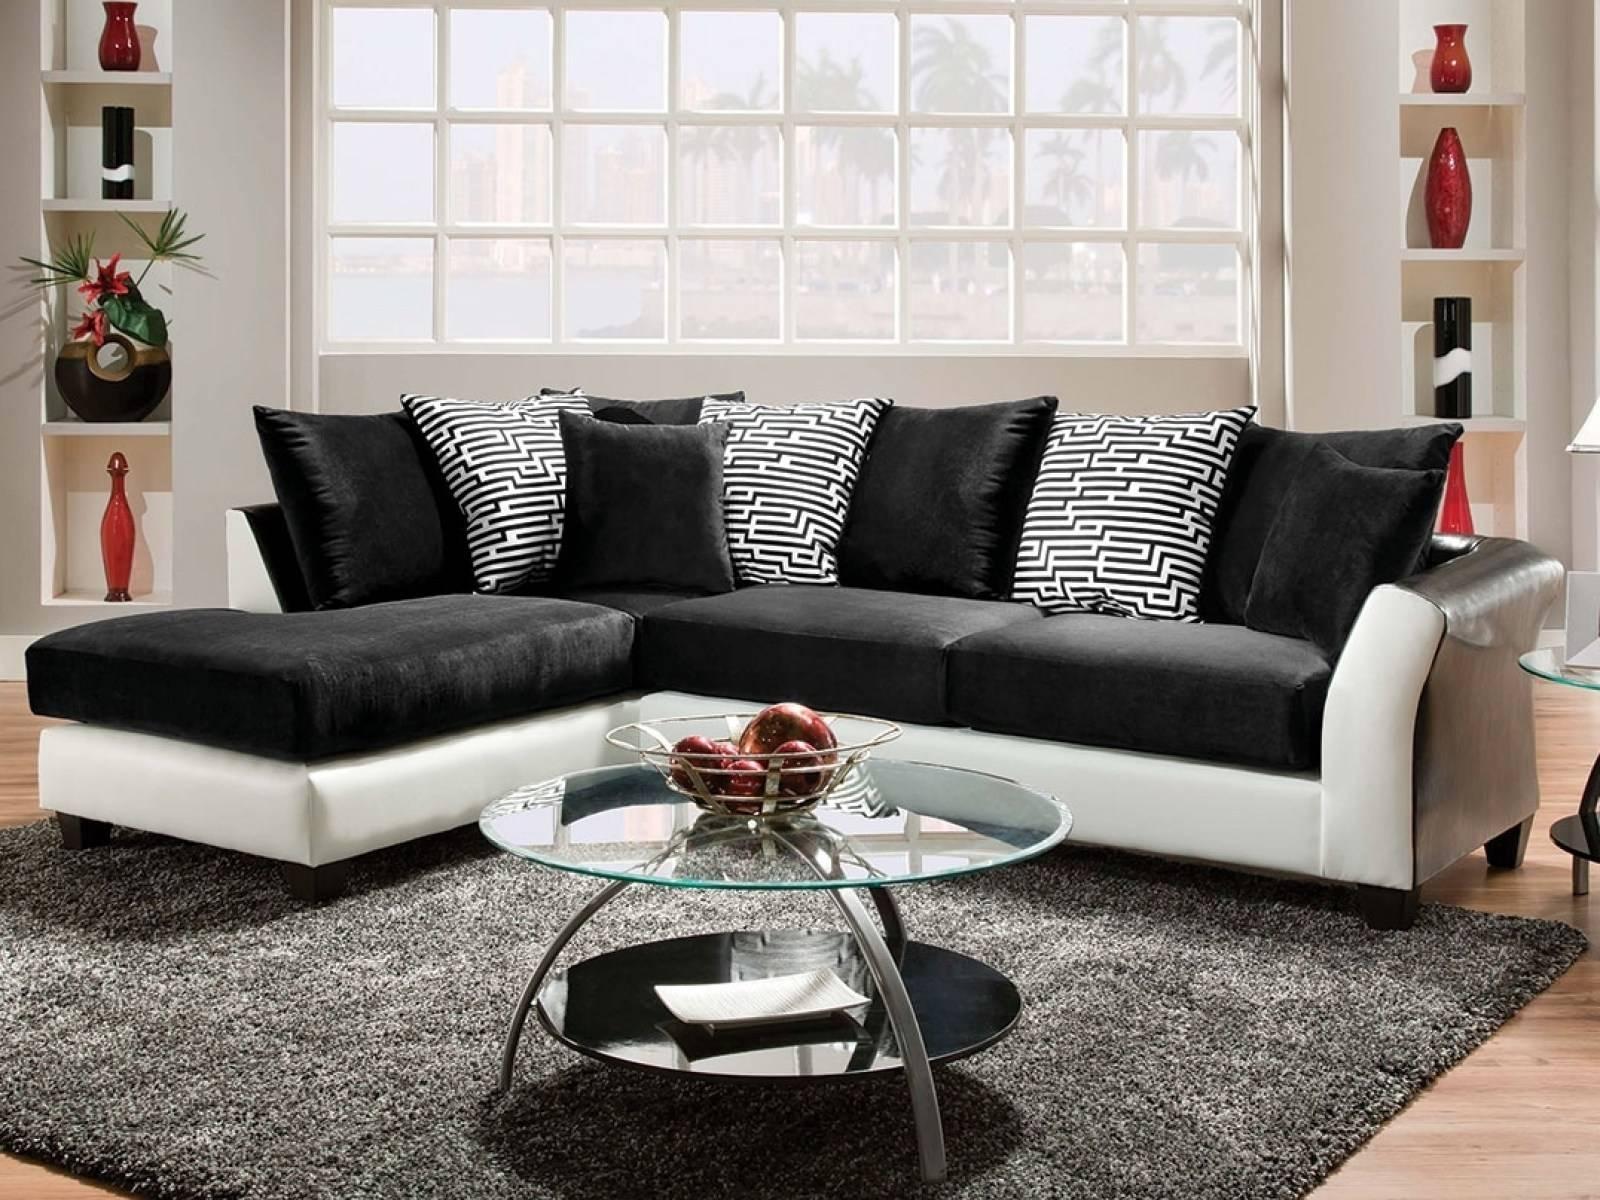 ☆▻ Sofa : 28 3032C2 Inside 89 Wonderful Black And White Sofa Set pertaining to Black And White Sofas (Image 30 of 30)